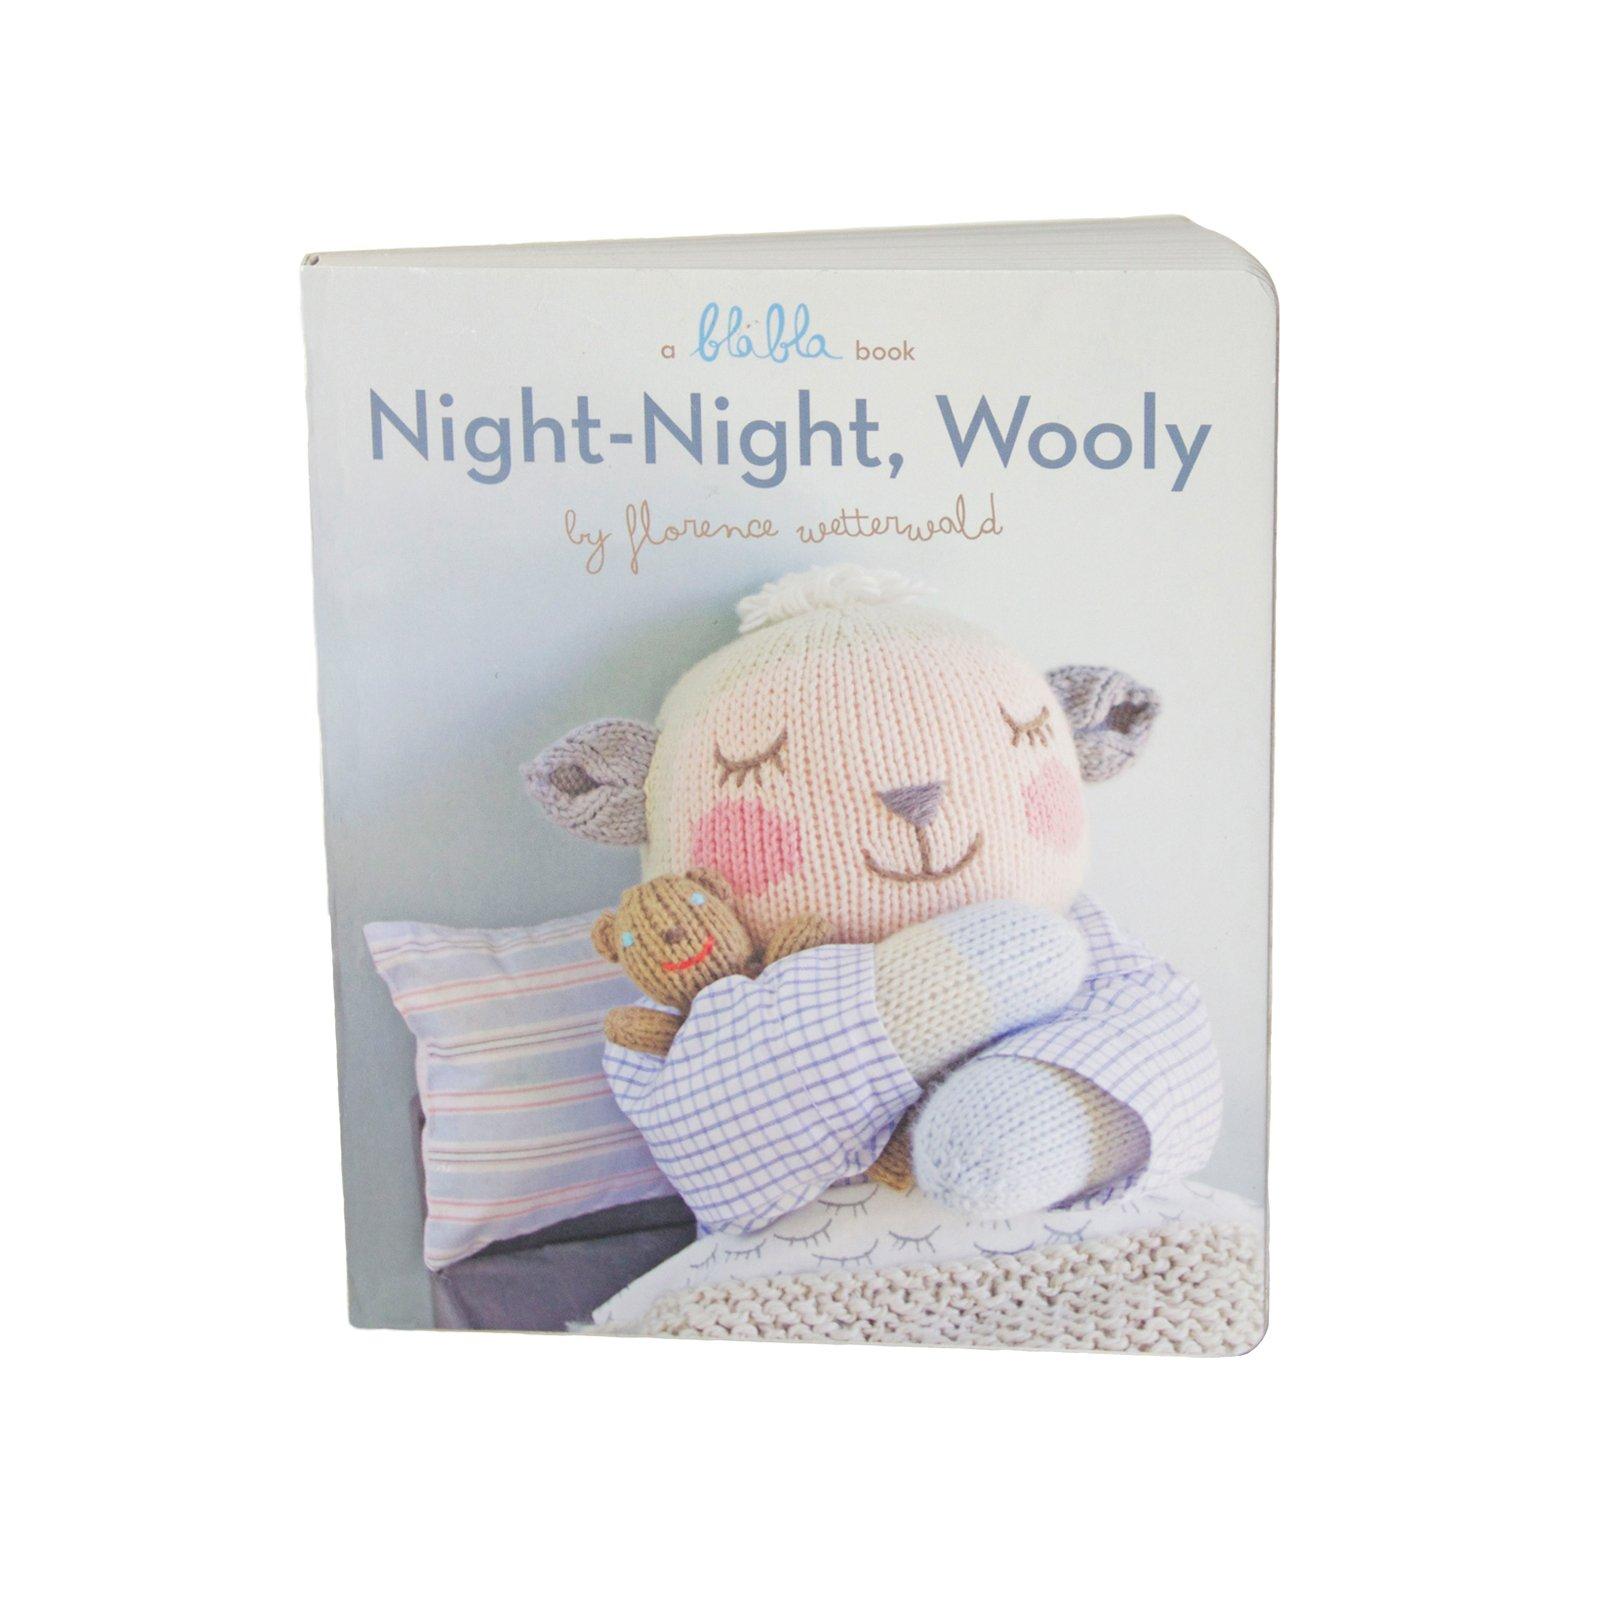 Blabla Night, Night Wooly Book